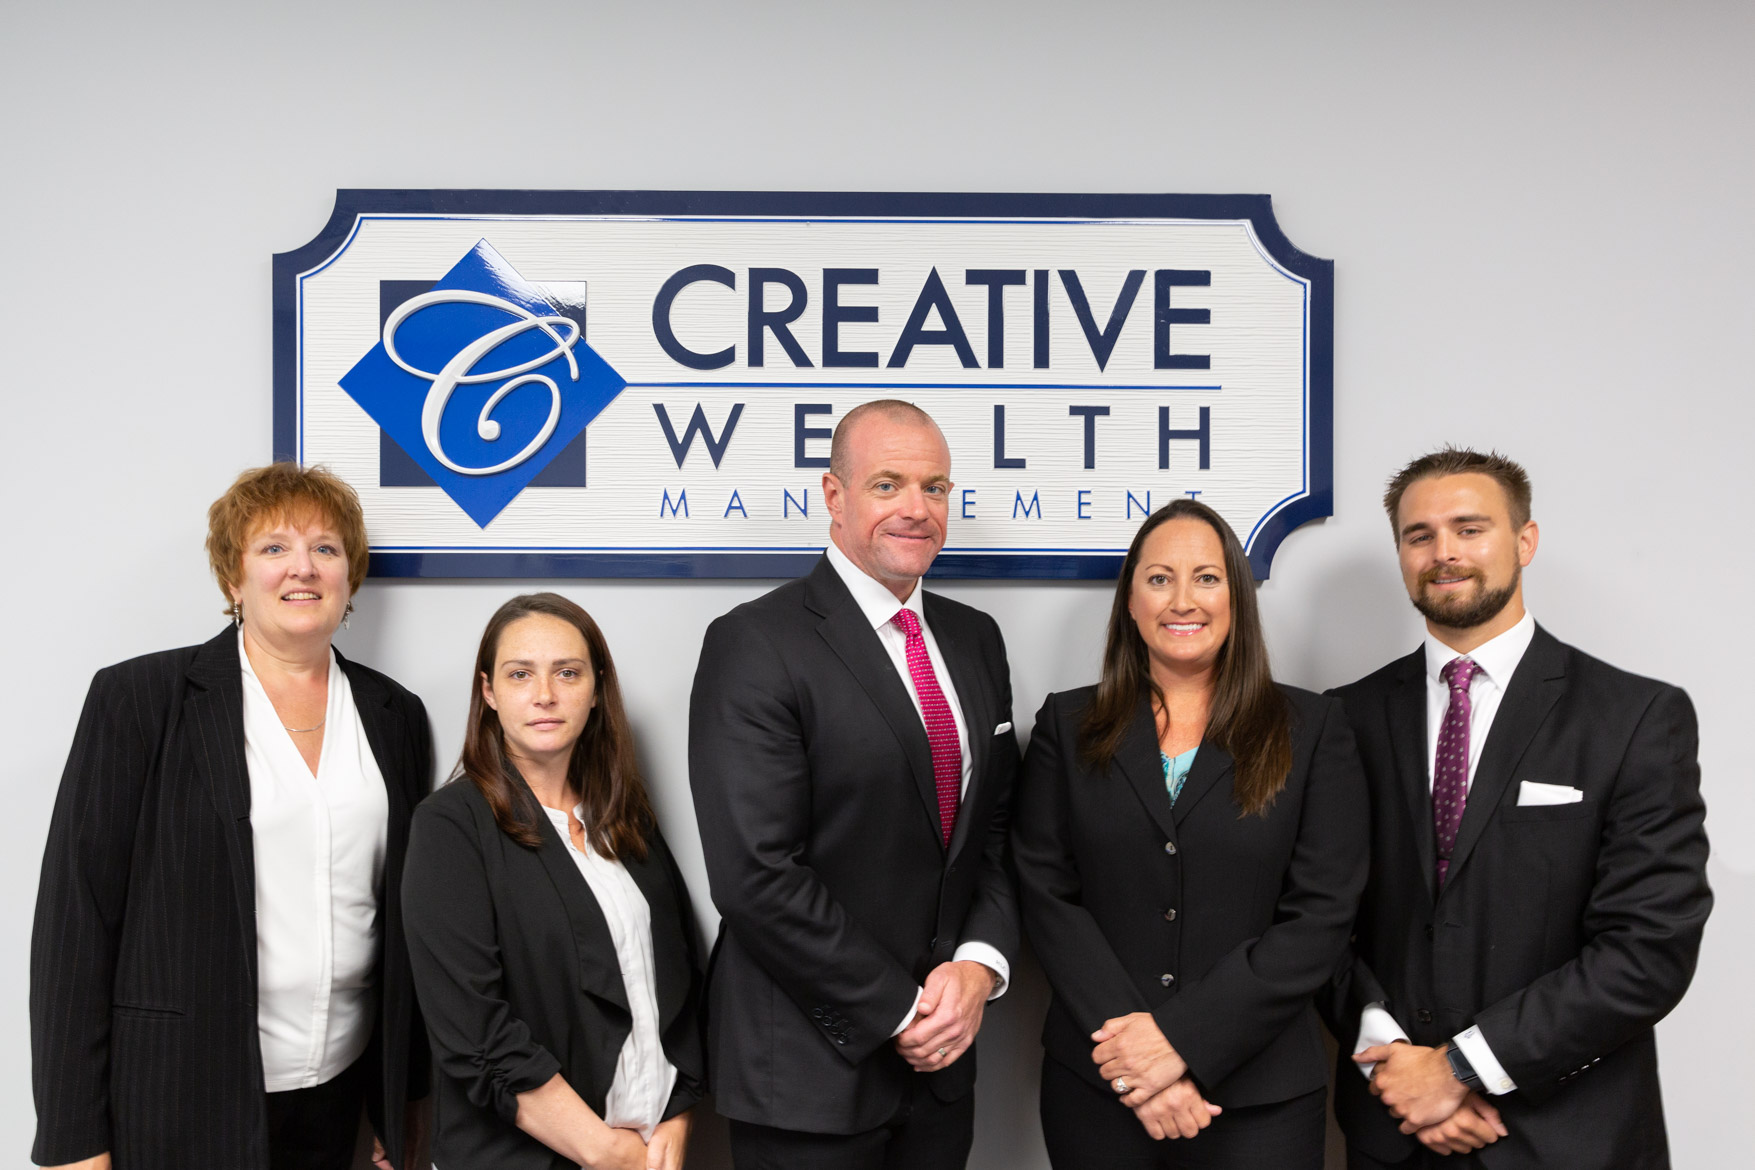 the creative wealth management team